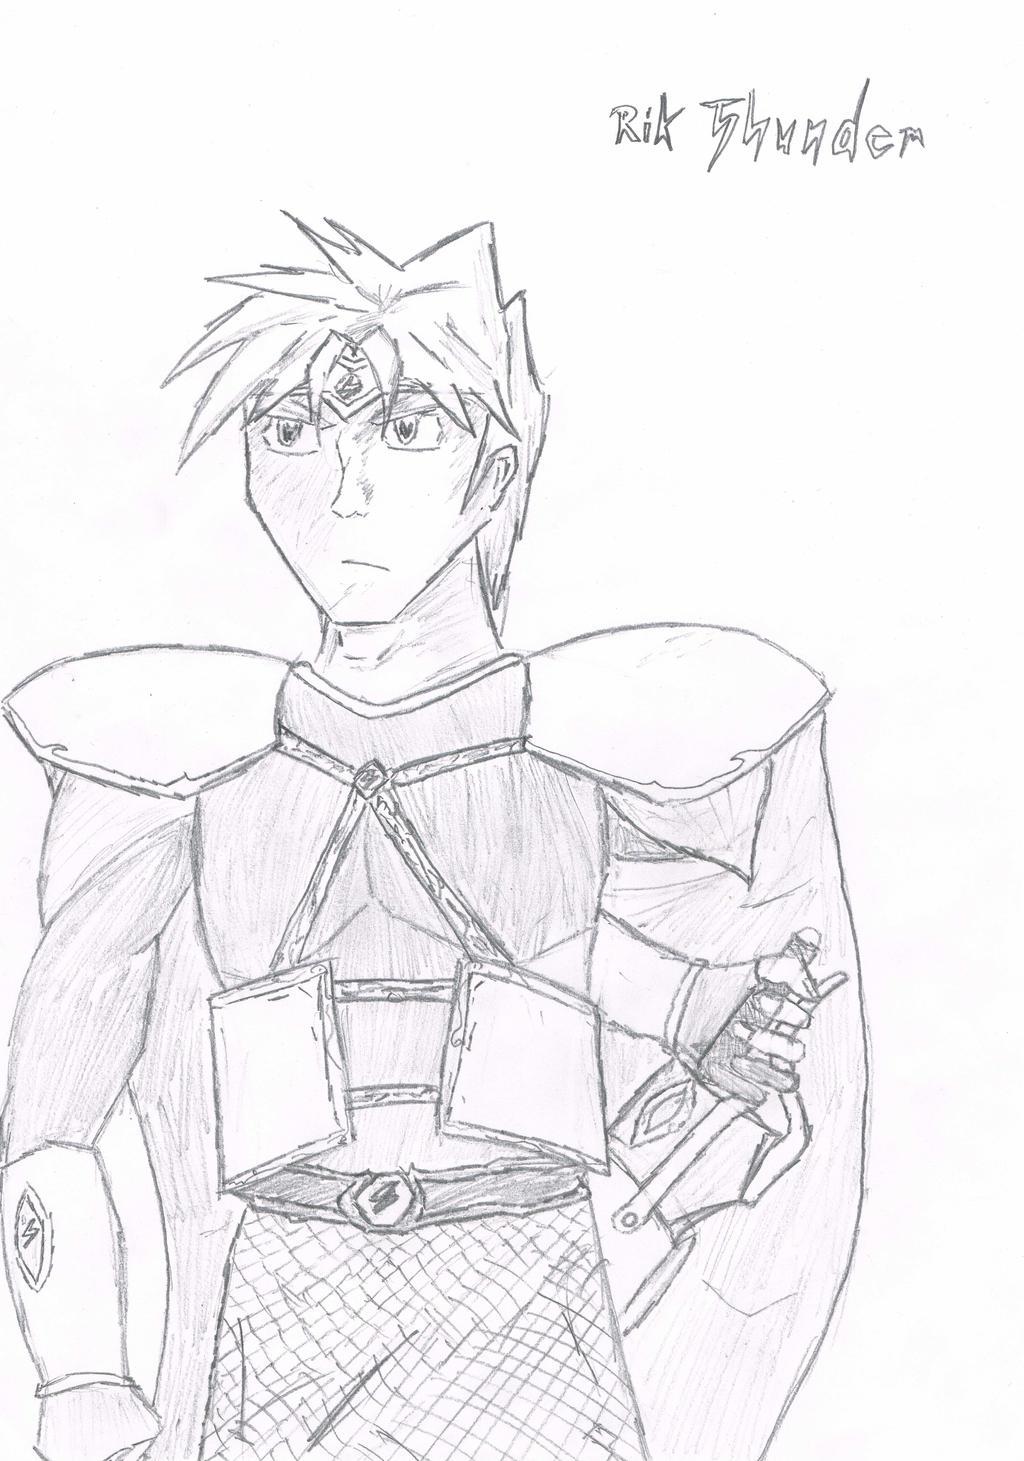 Emperor Rik by RikThunder